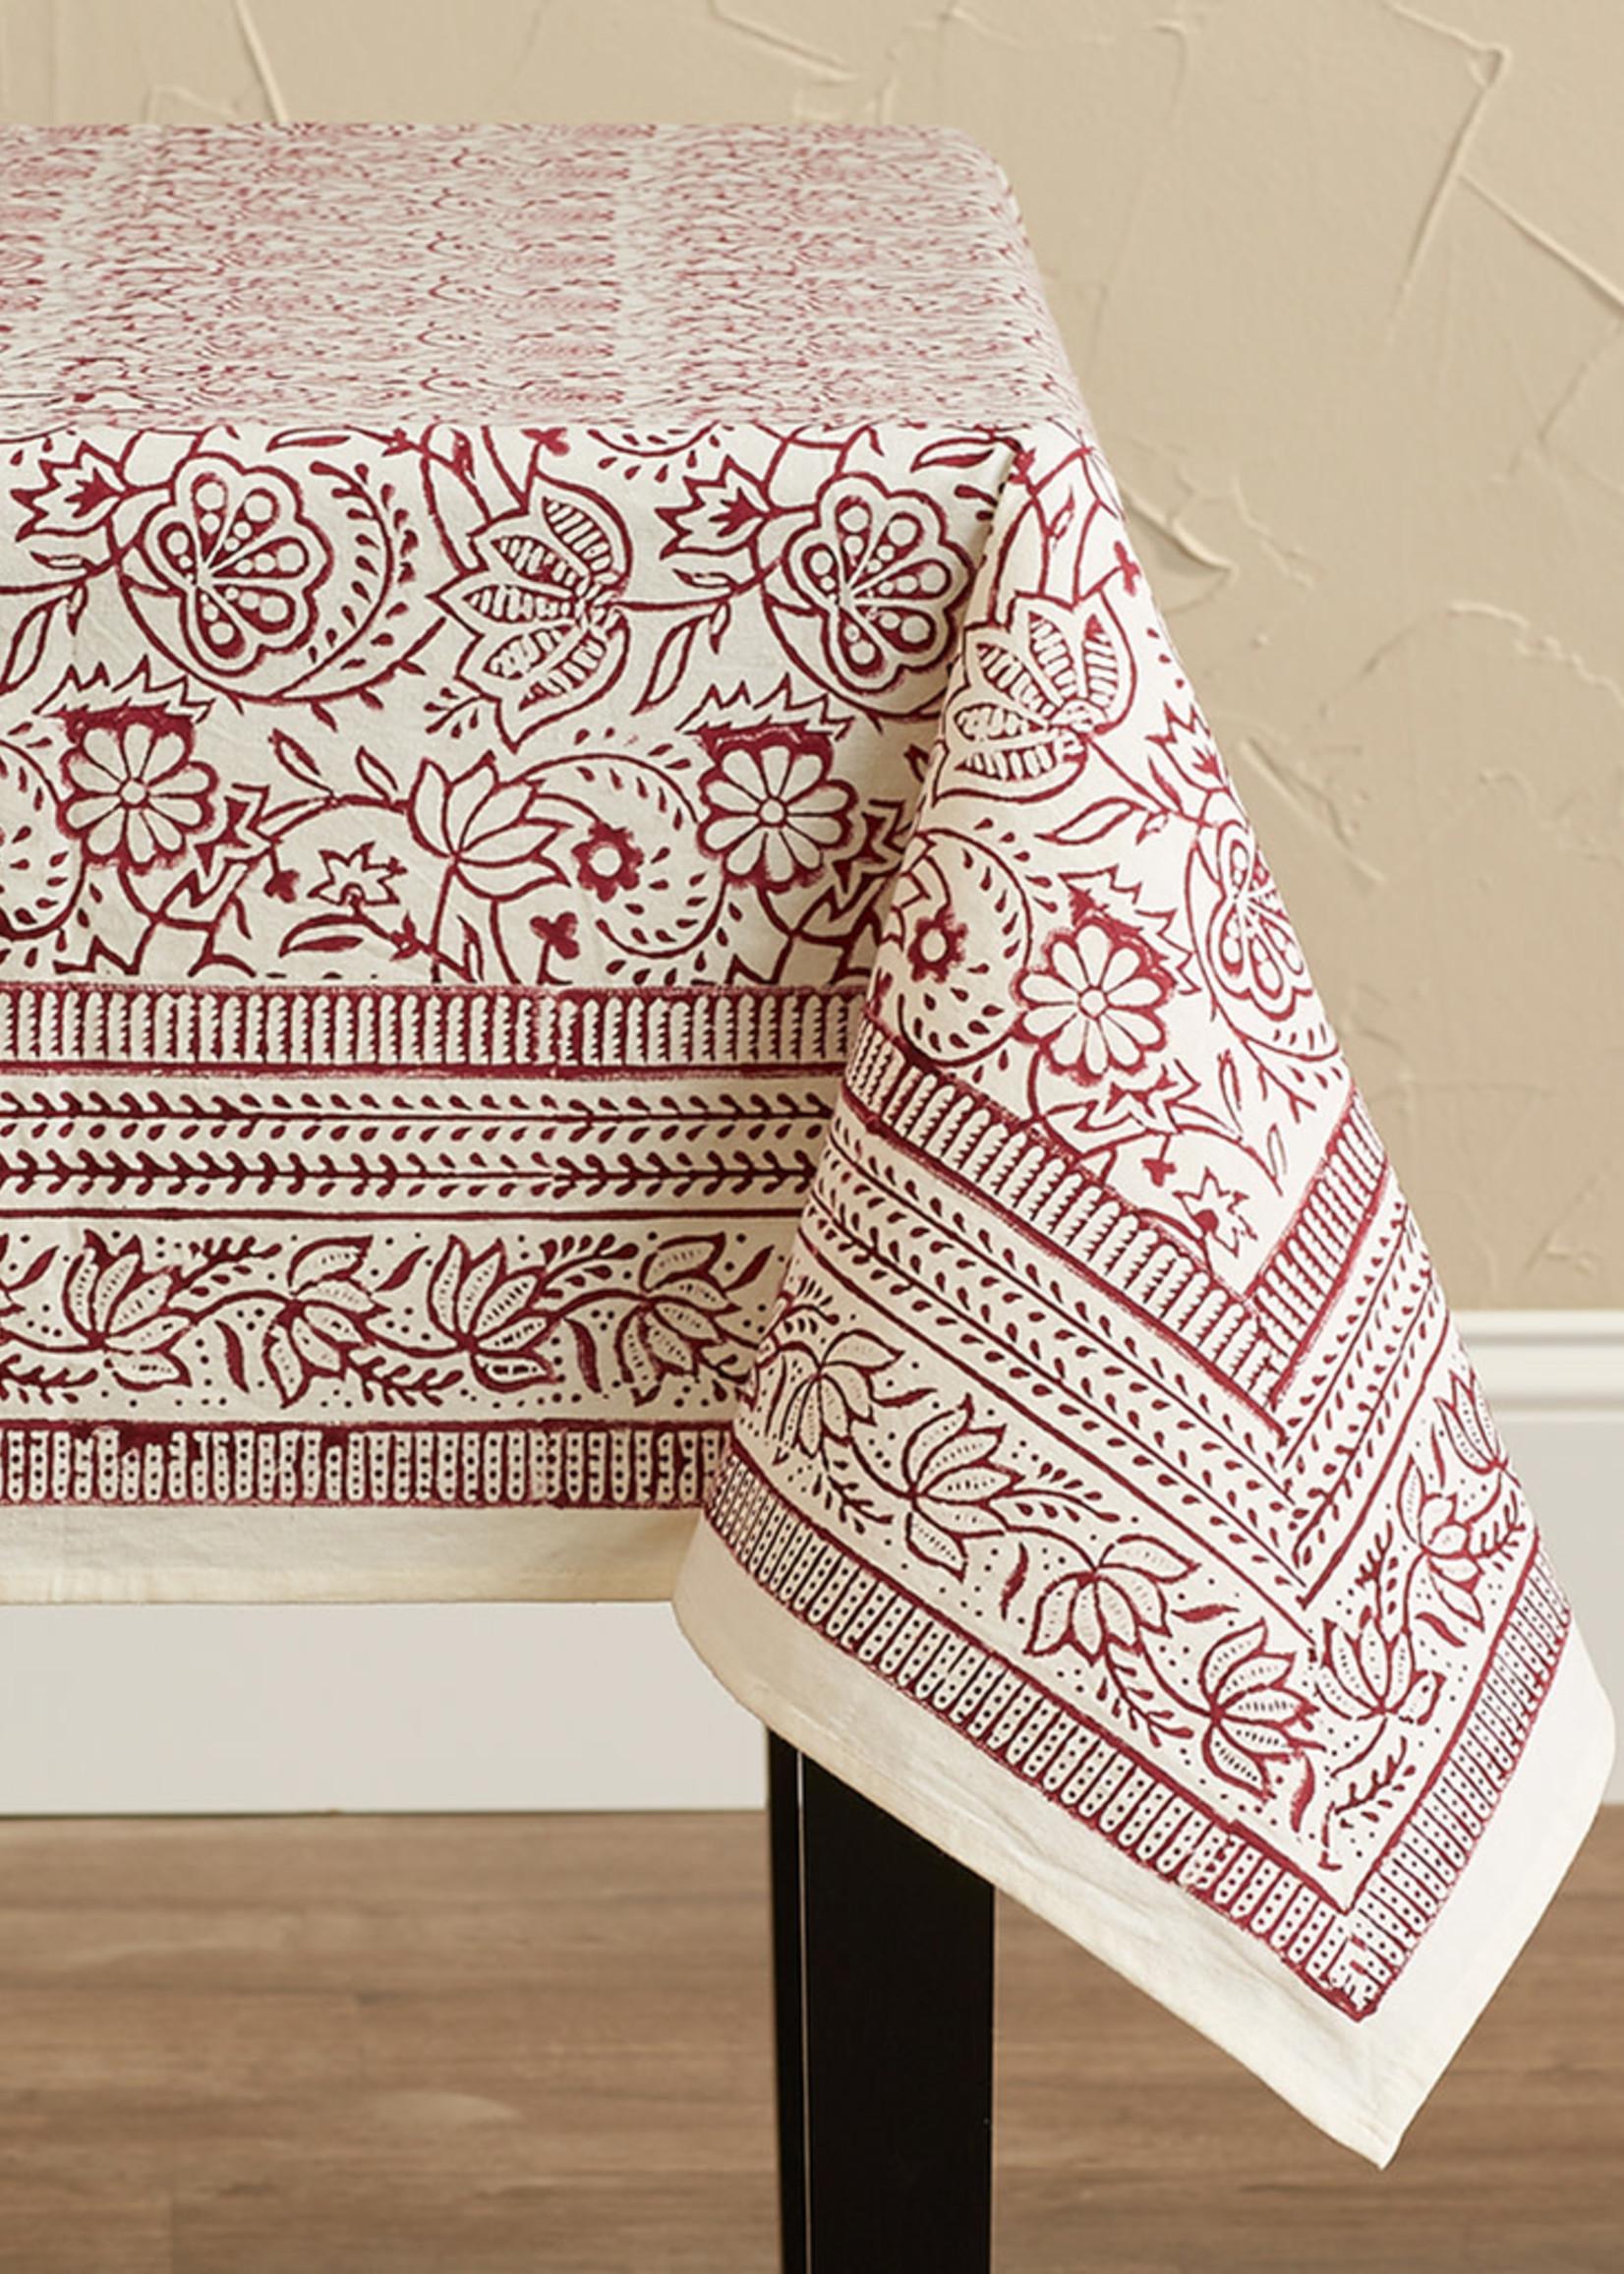 Cranberry Vine Tablecloth